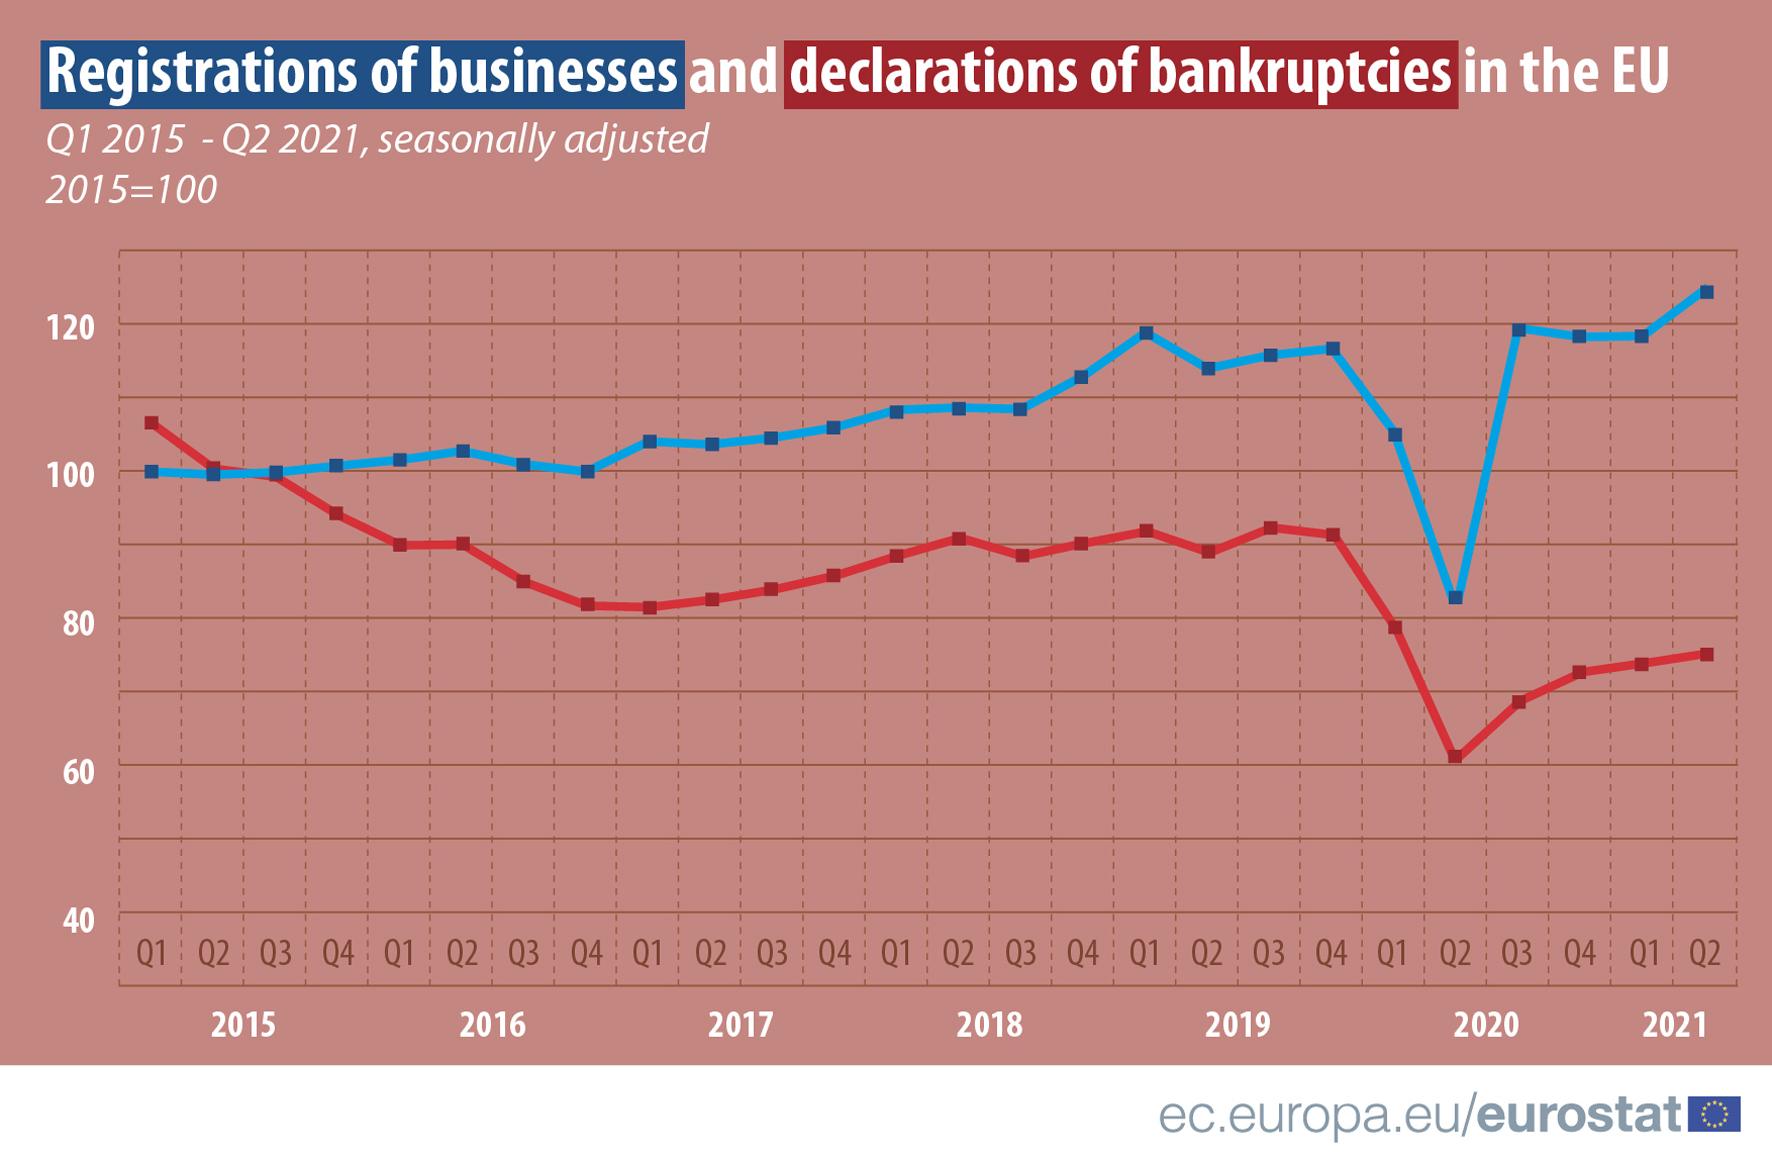 Line chart: Registrations of businesses and declarations bankruptcies , EU, quarterly data 2015Q1-2021Q2, seasonally adjusted, 2015=100